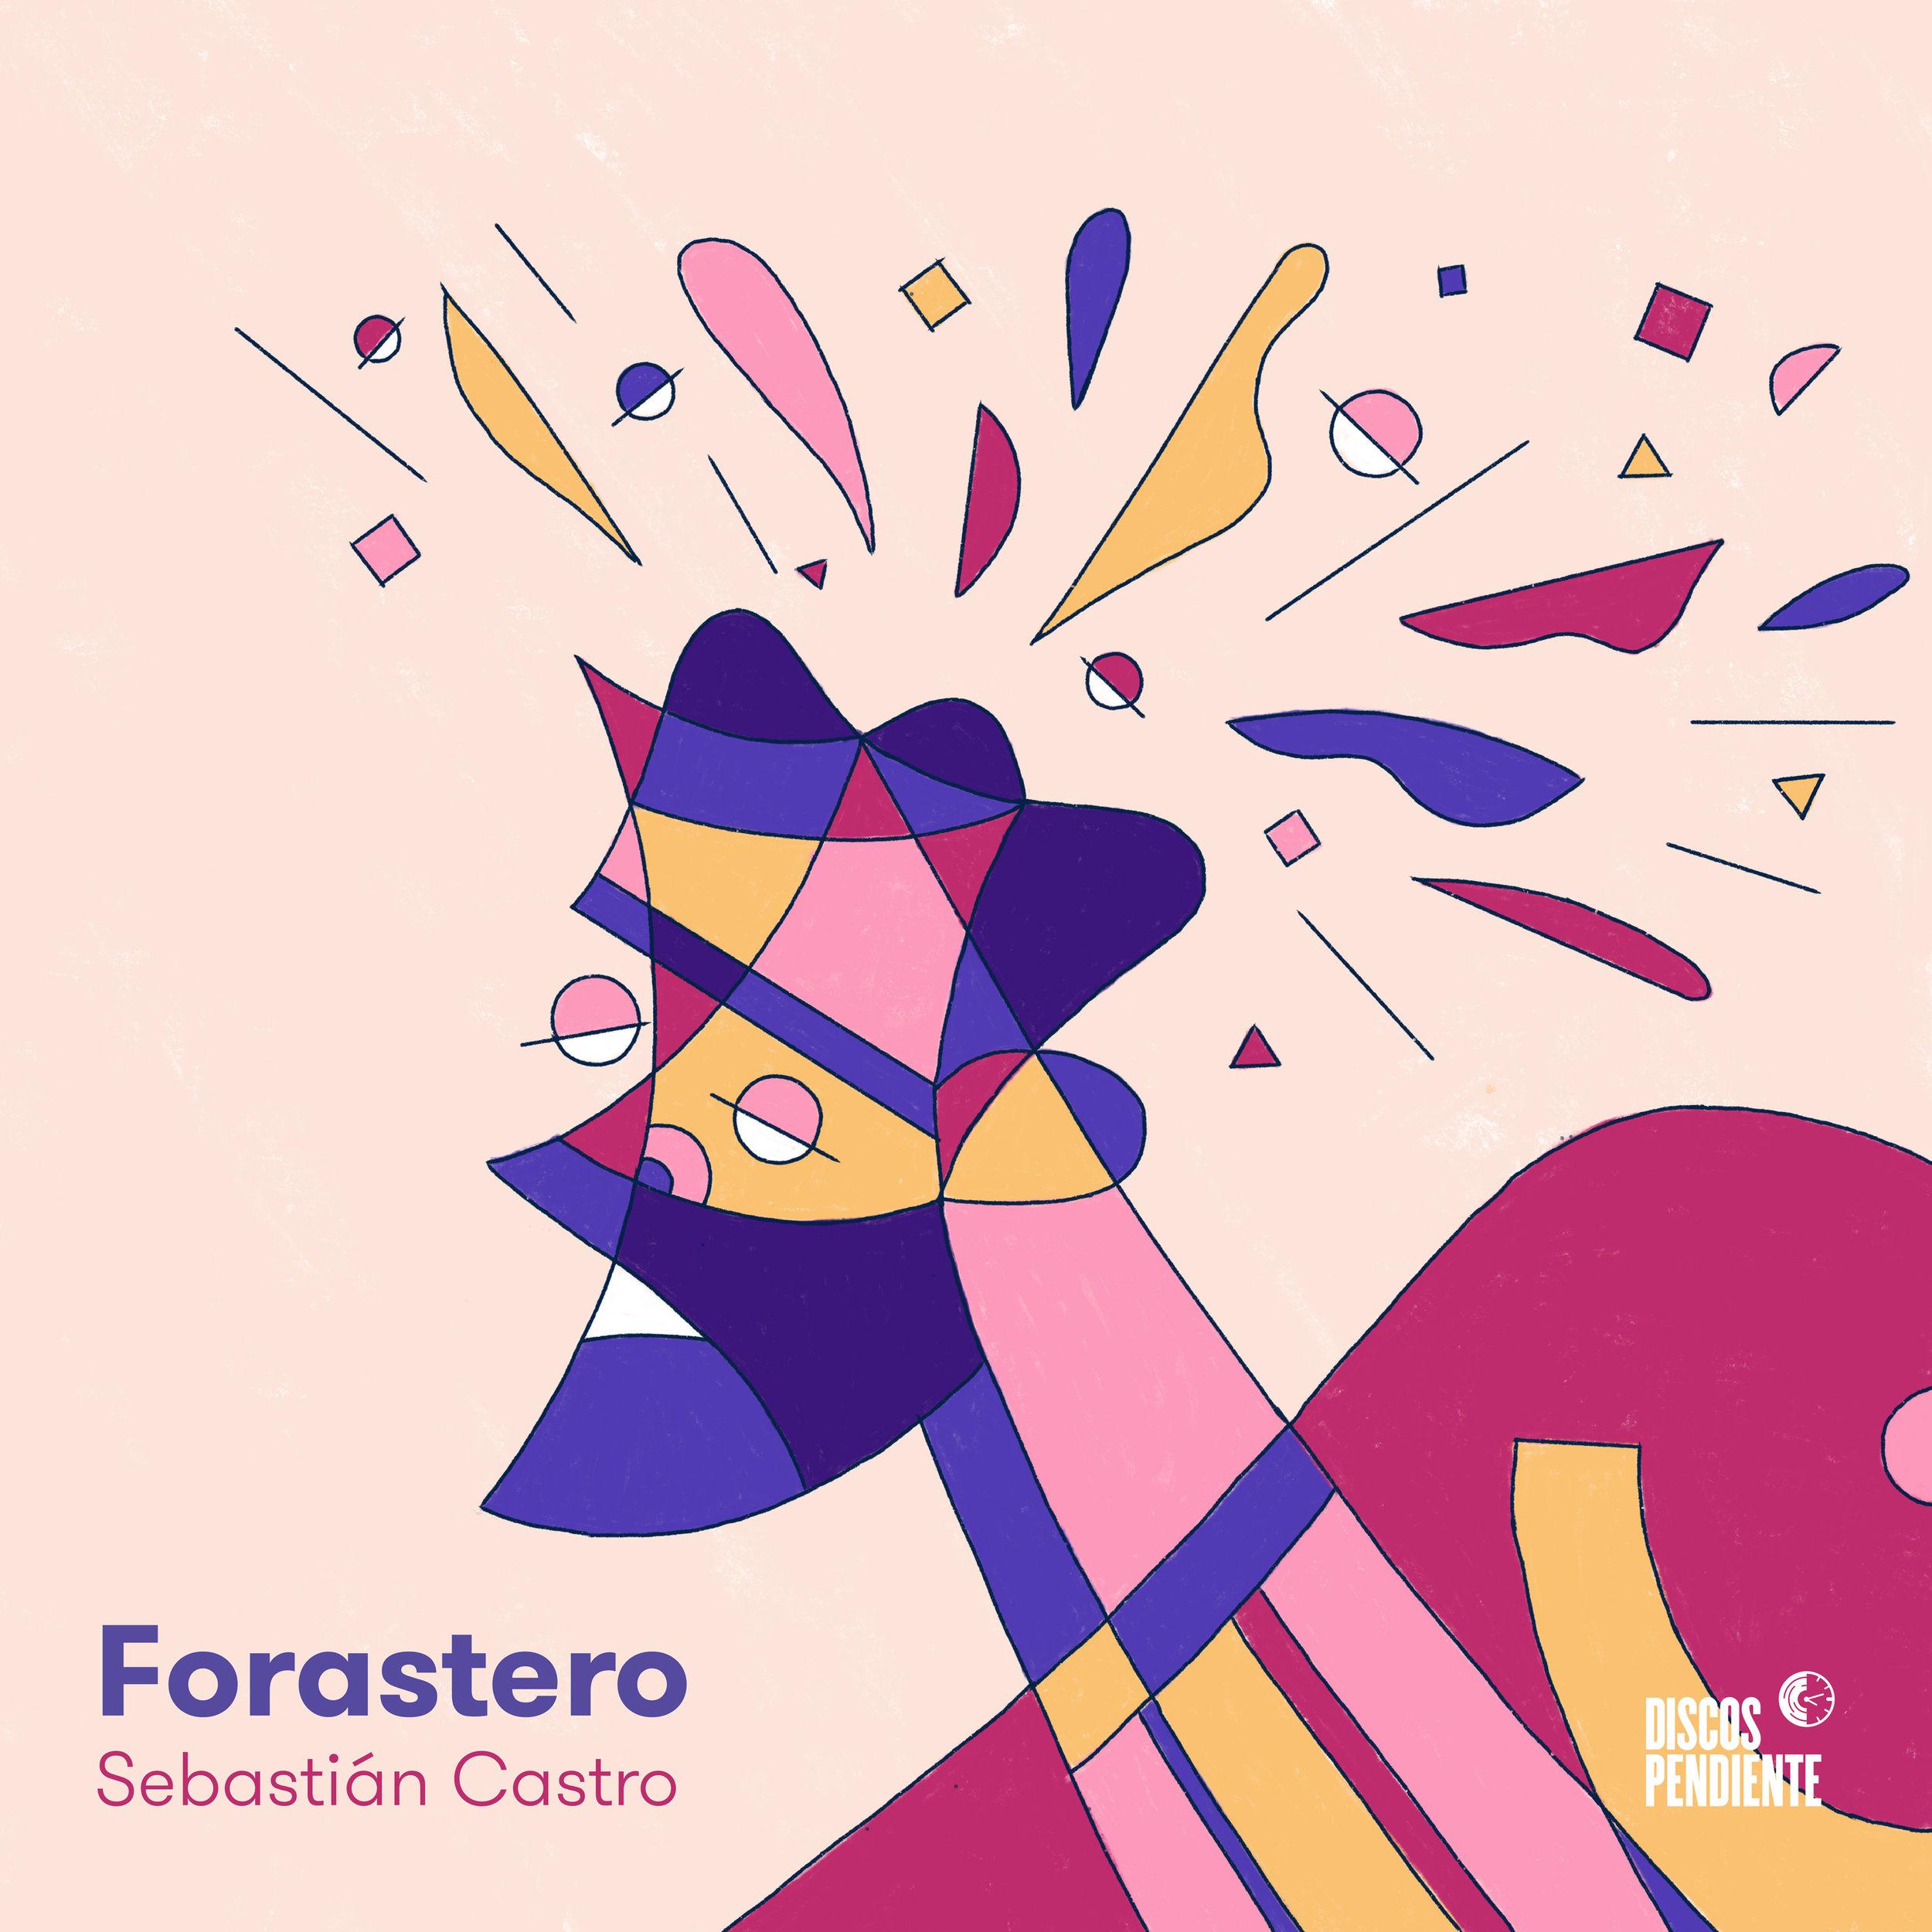 forastero-spotify-itunes.jpg